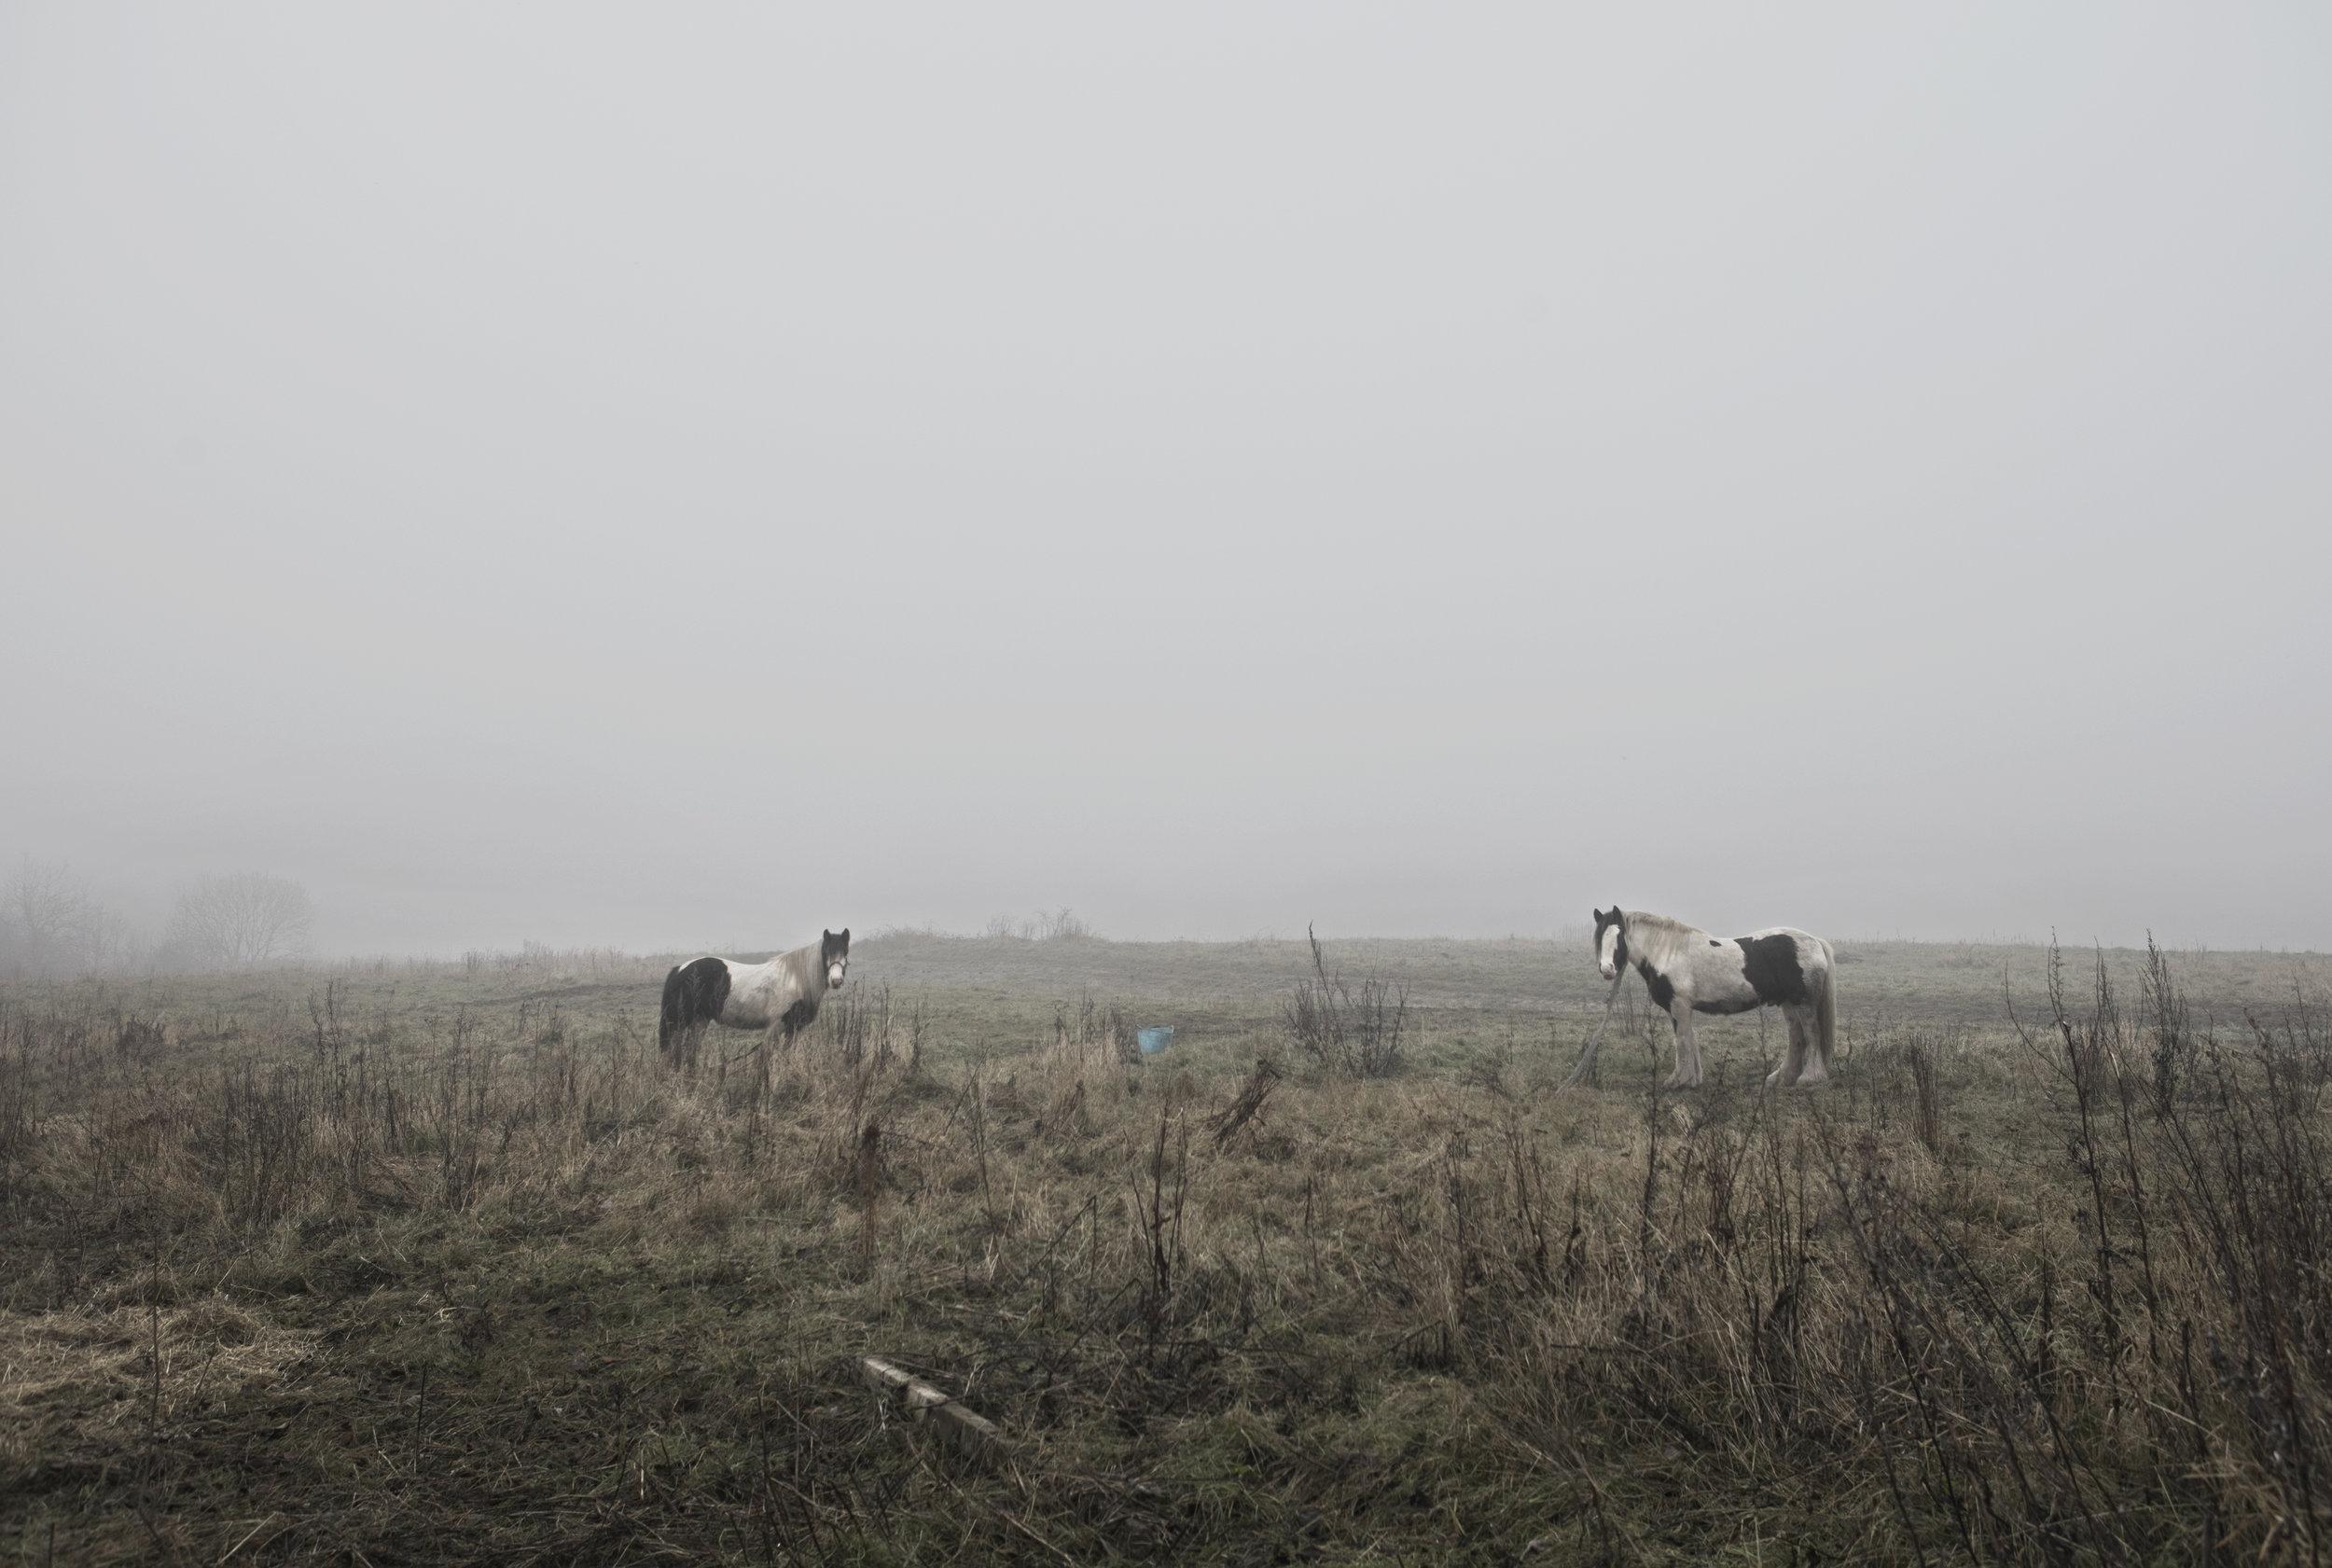 Dan Prince - horses in misty landscape